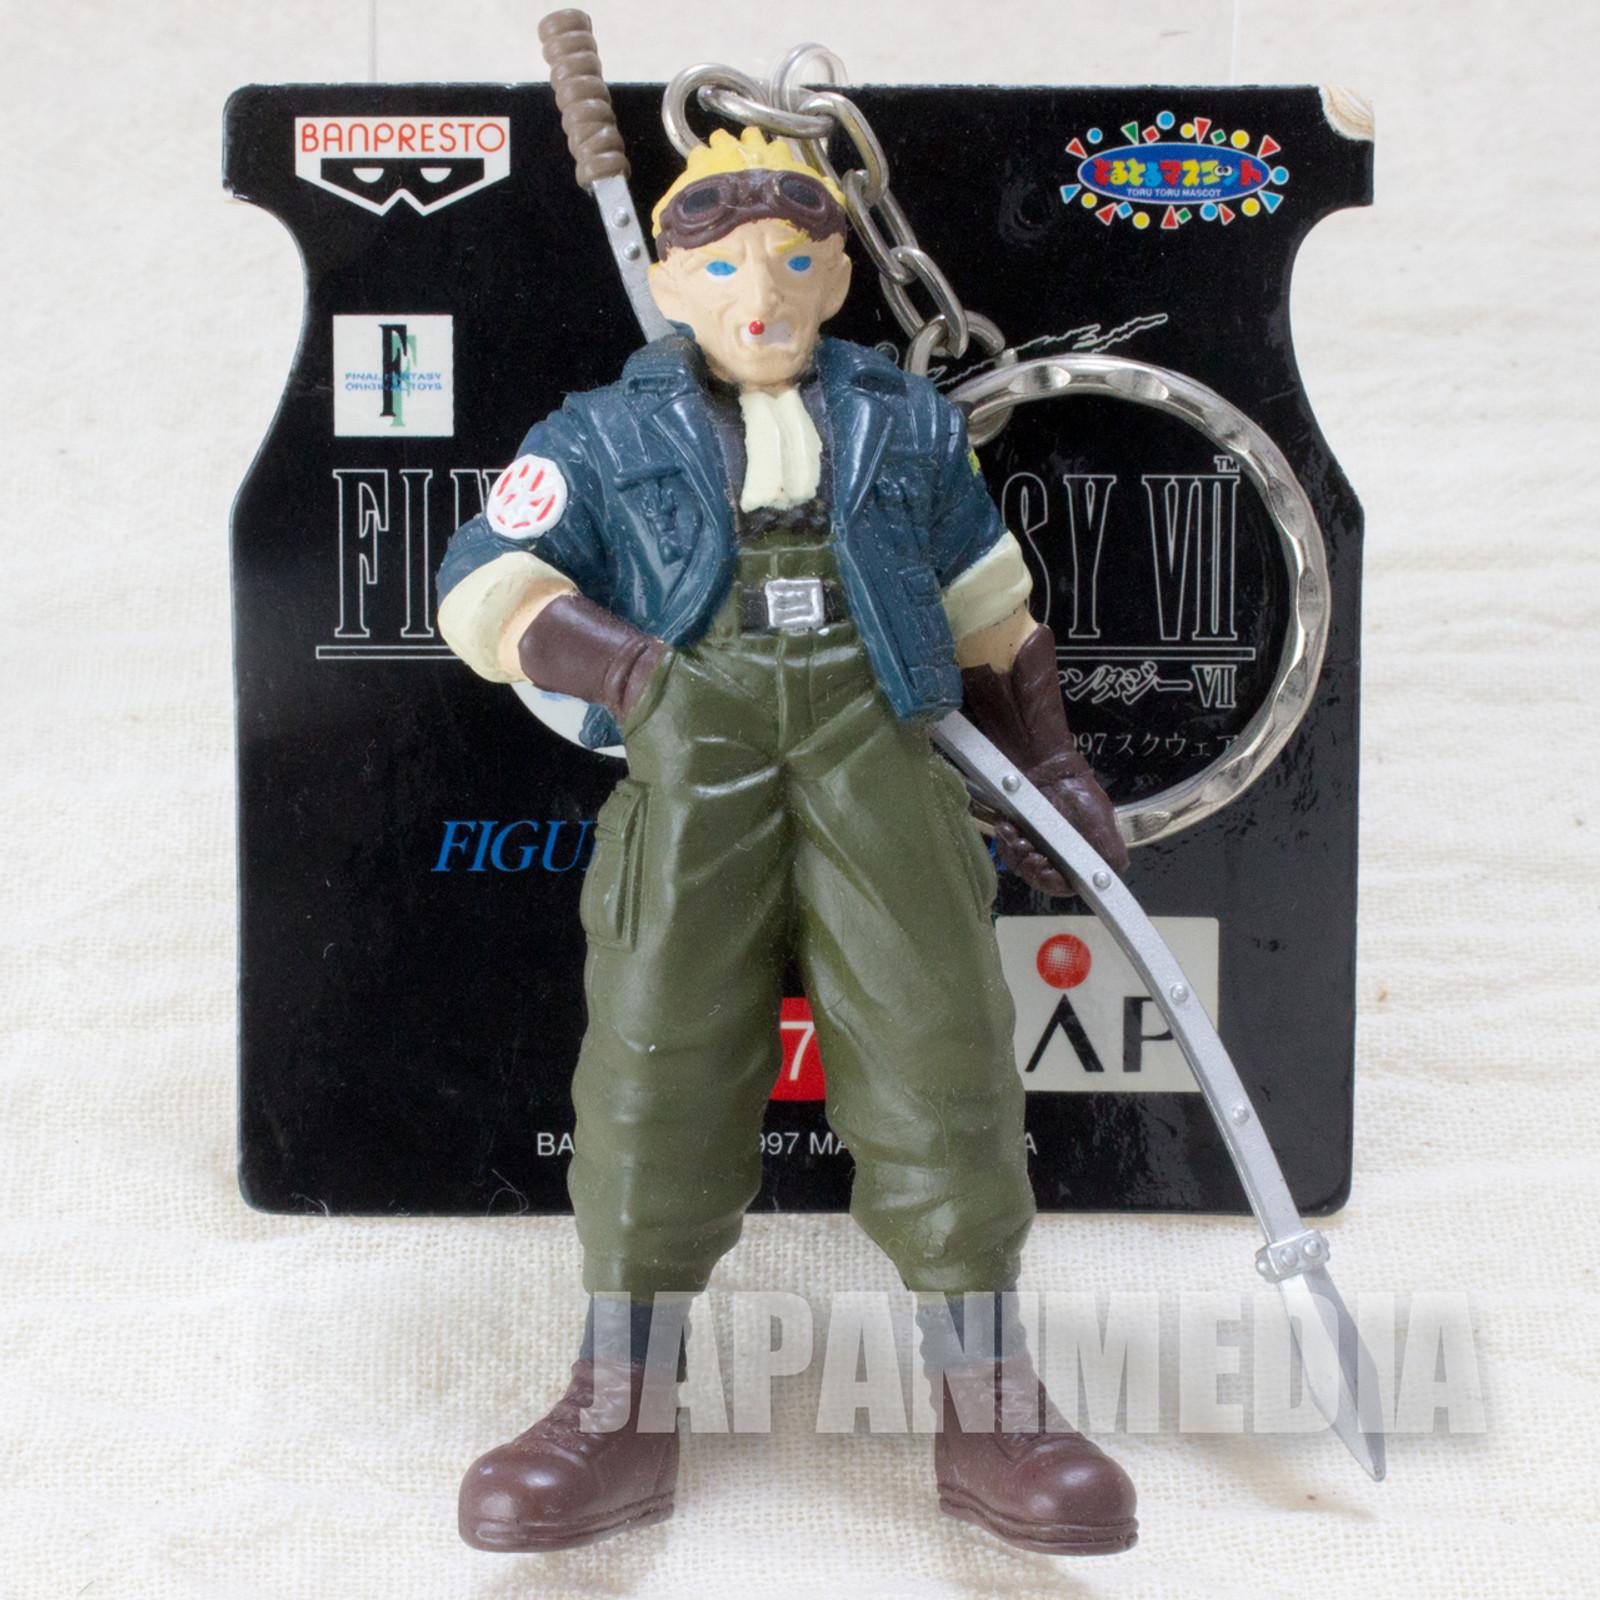 Final Fantasy VII Cid Figure Key Chain Banpresto JAPAN SQUARE ENIX